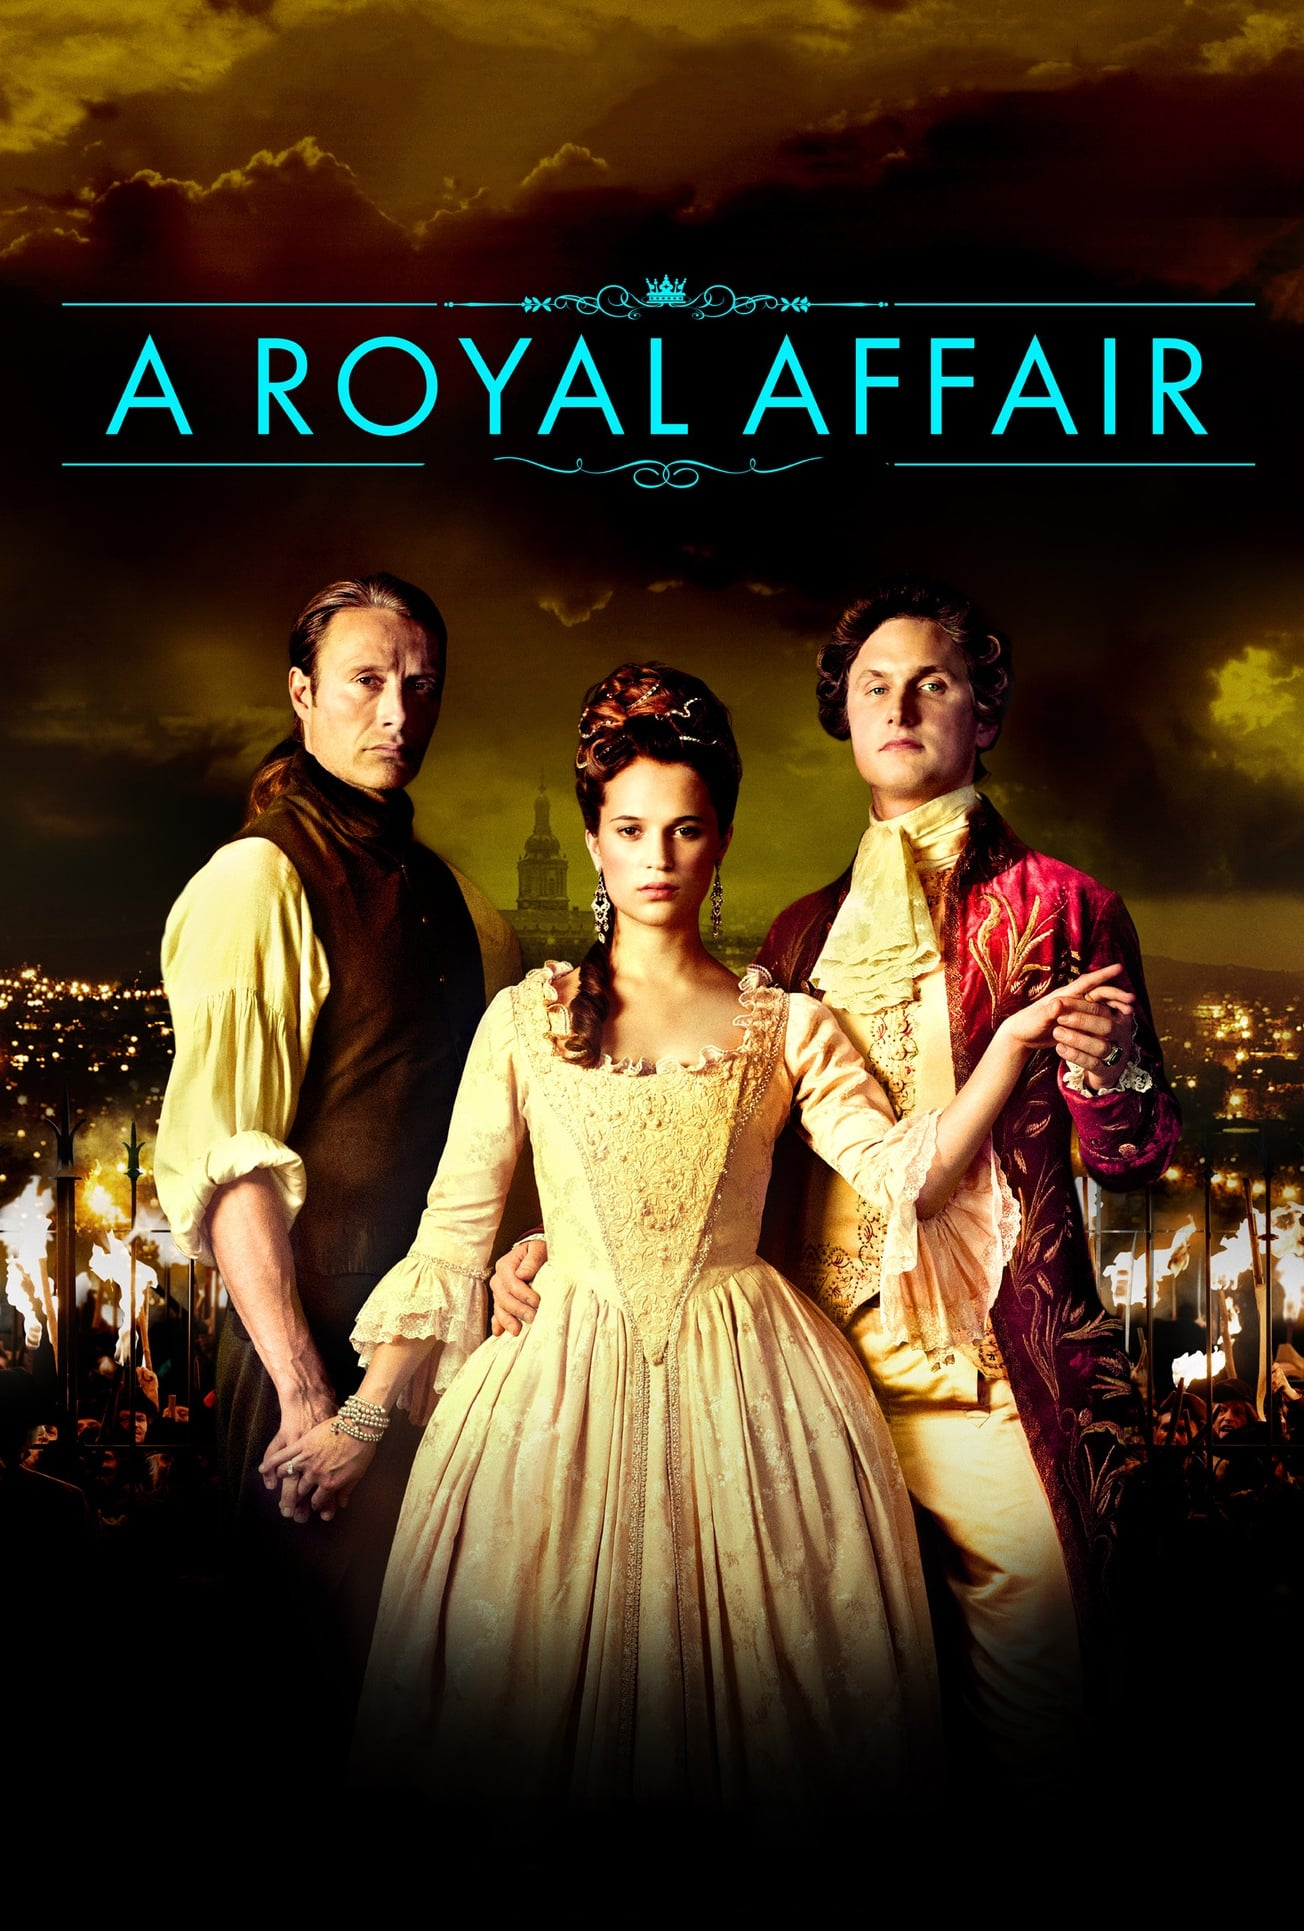 A Royal Affair on FREECABLE TV